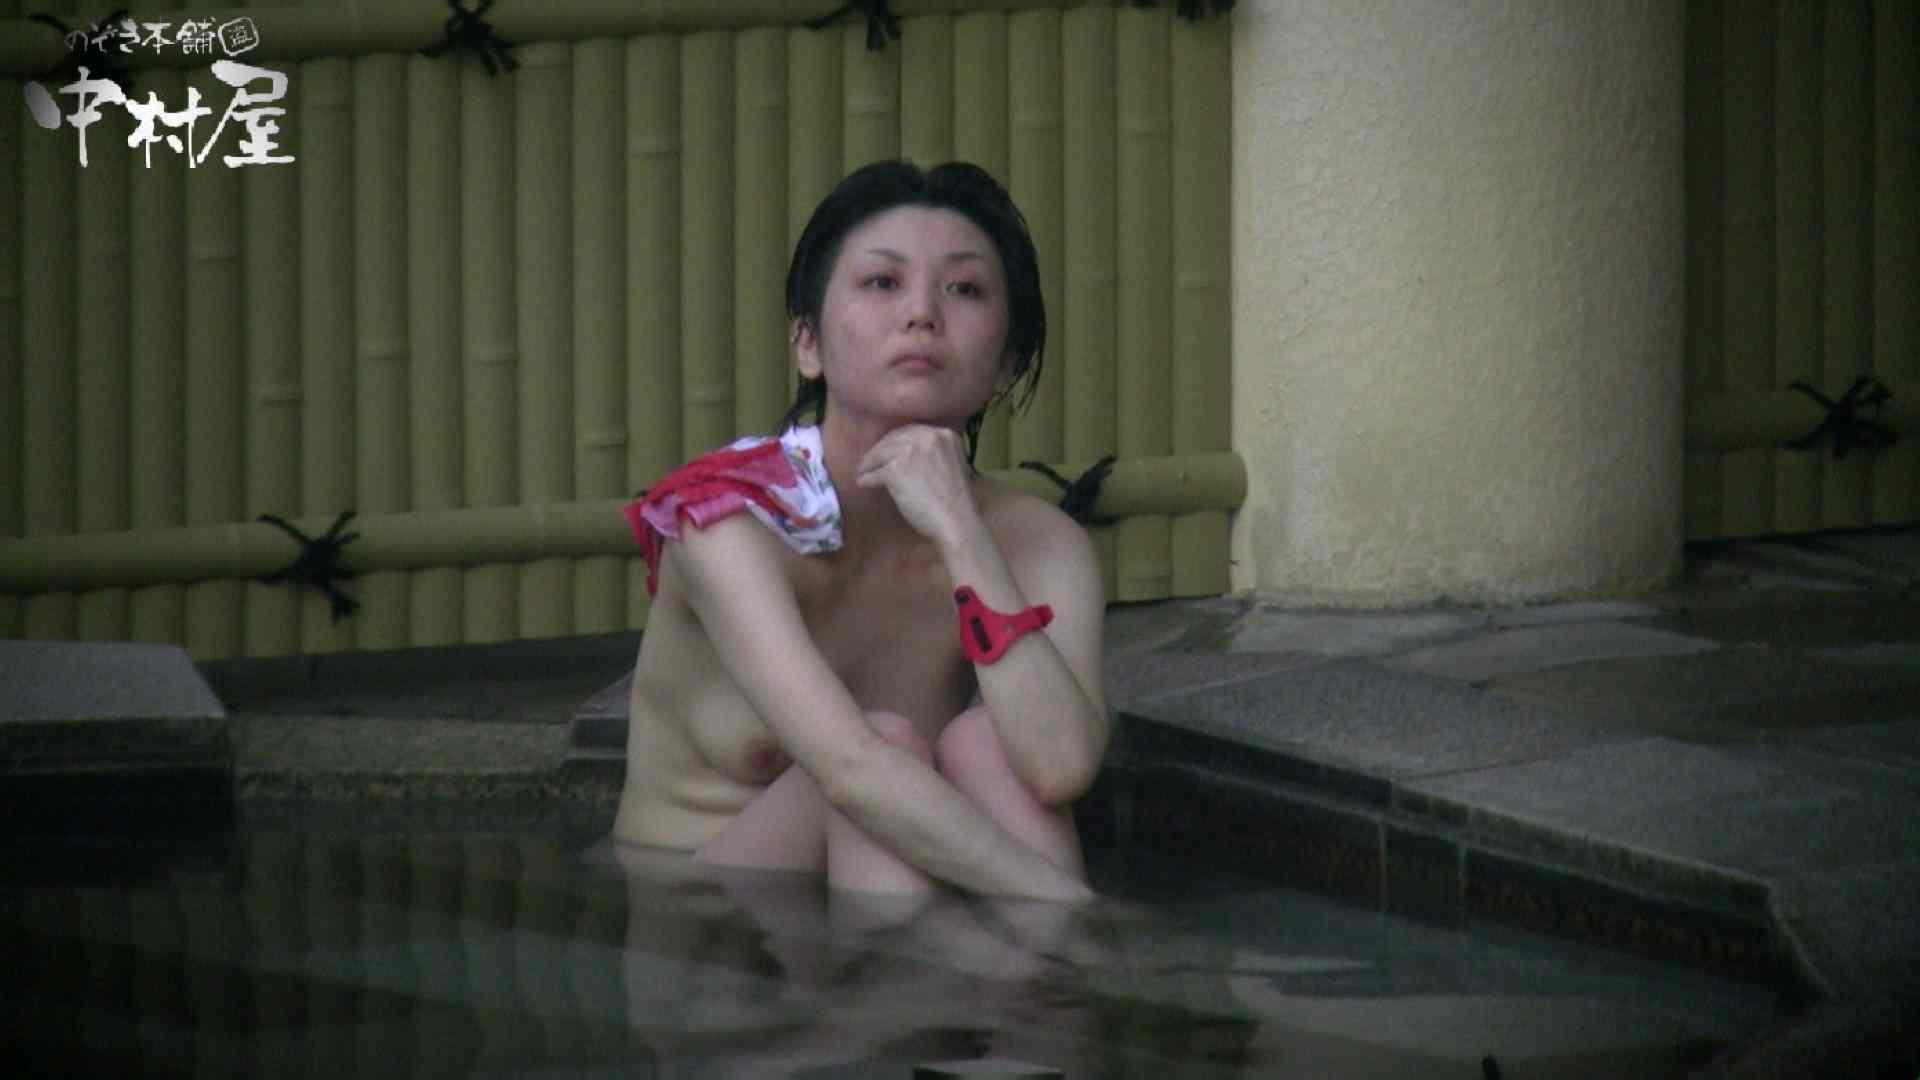 Aquaな露天風呂Vol.884 露天風呂突入 ワレメ動画紹介 92pic 89